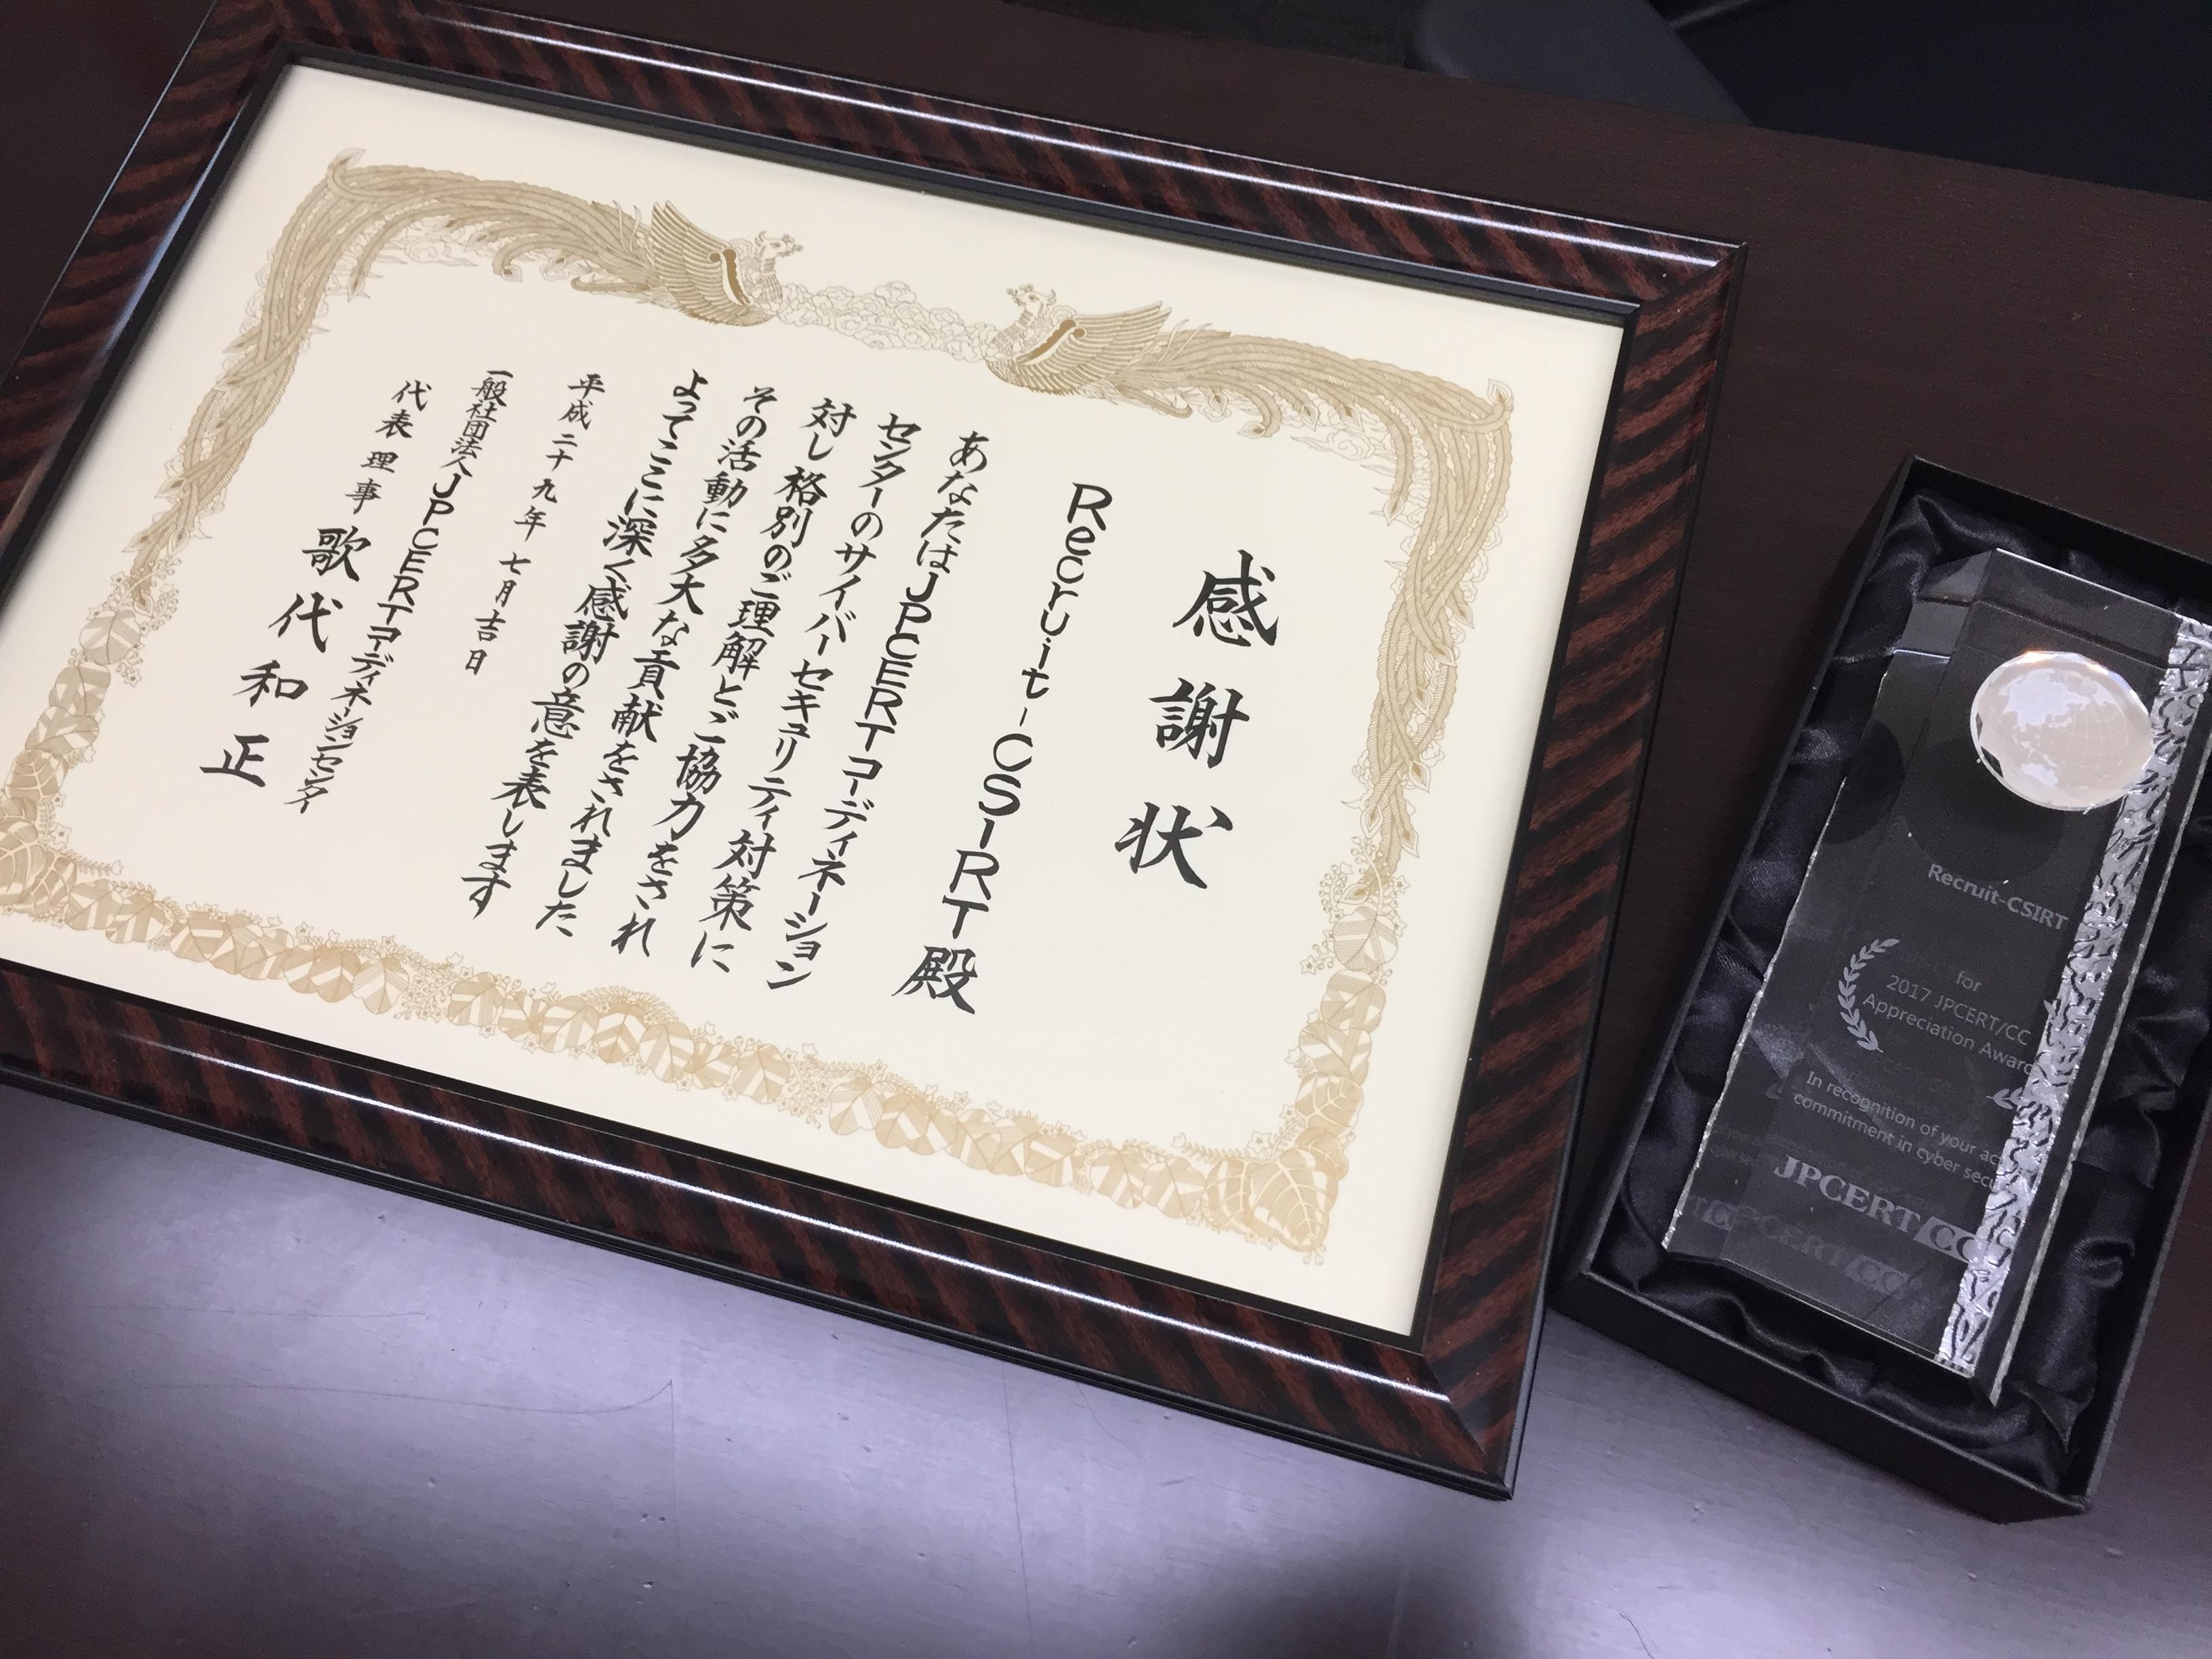 Recruit-CSIRTの活動紹介【JPCERT/CC 感謝状 2017 受領記念】